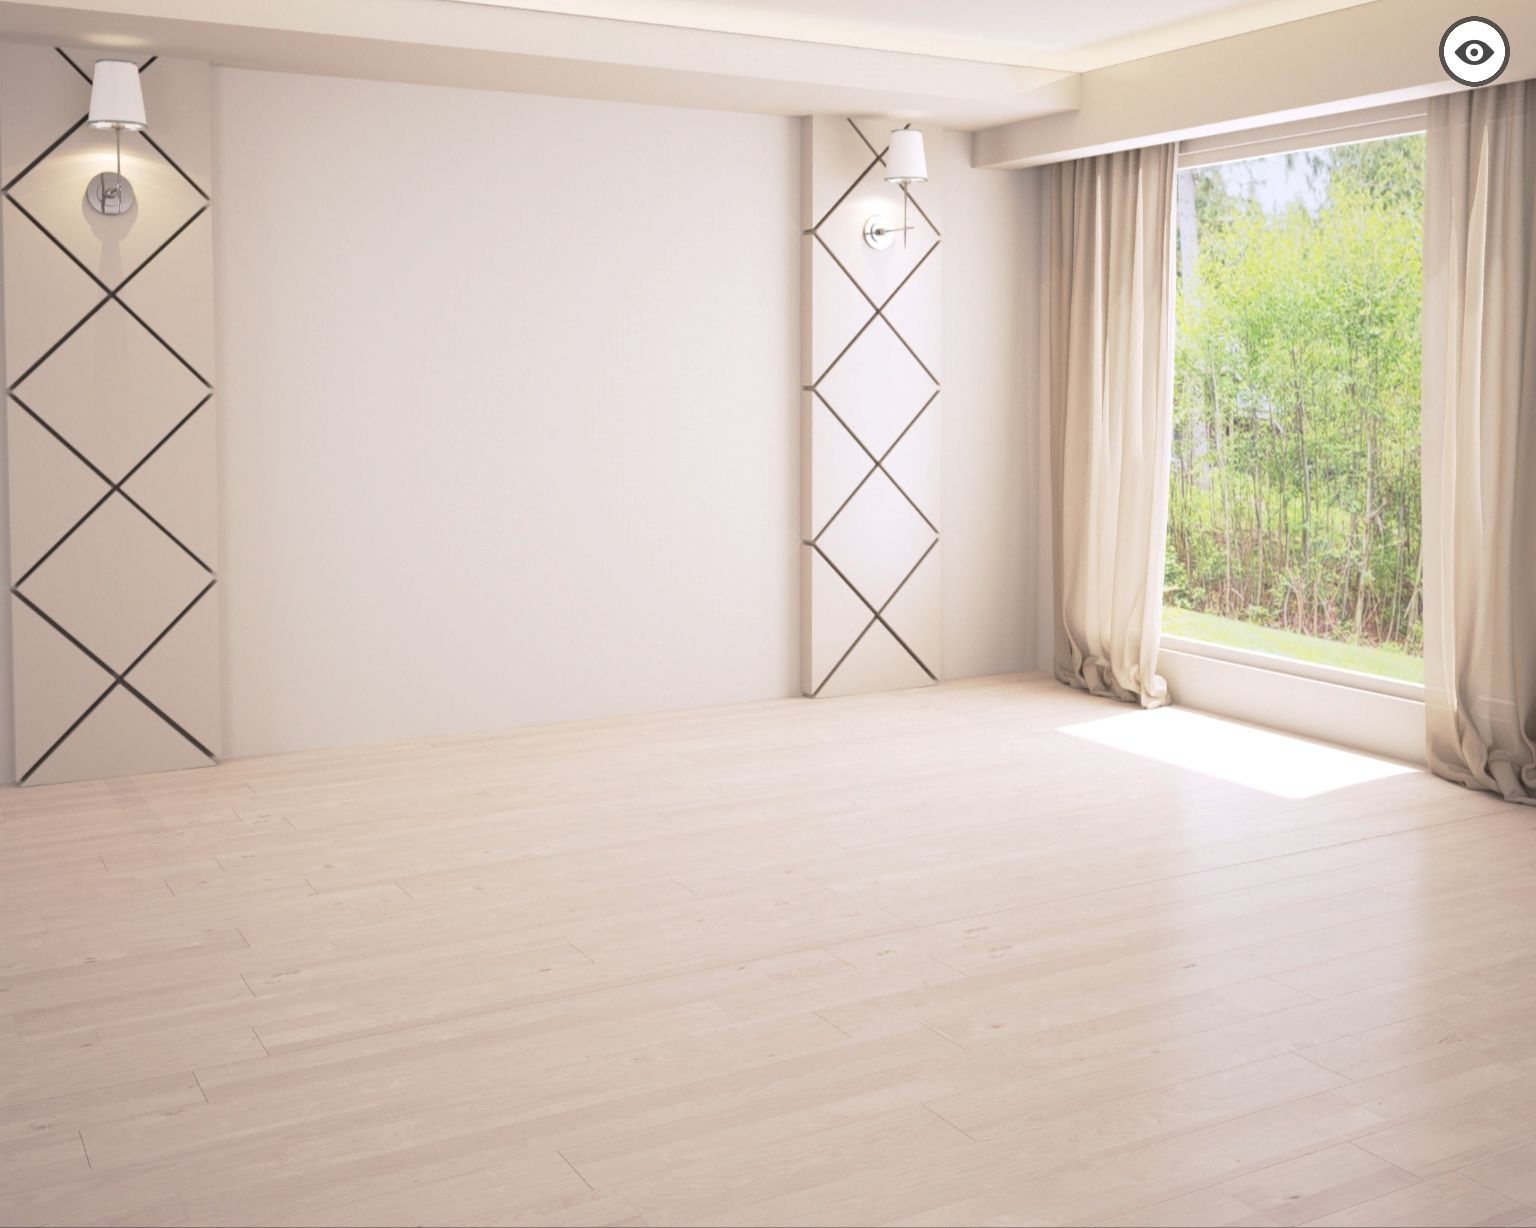 Pin By Christina Interiordesigner On Templates Empty Room Room Design [ 1228 x 1536 Pixel ]